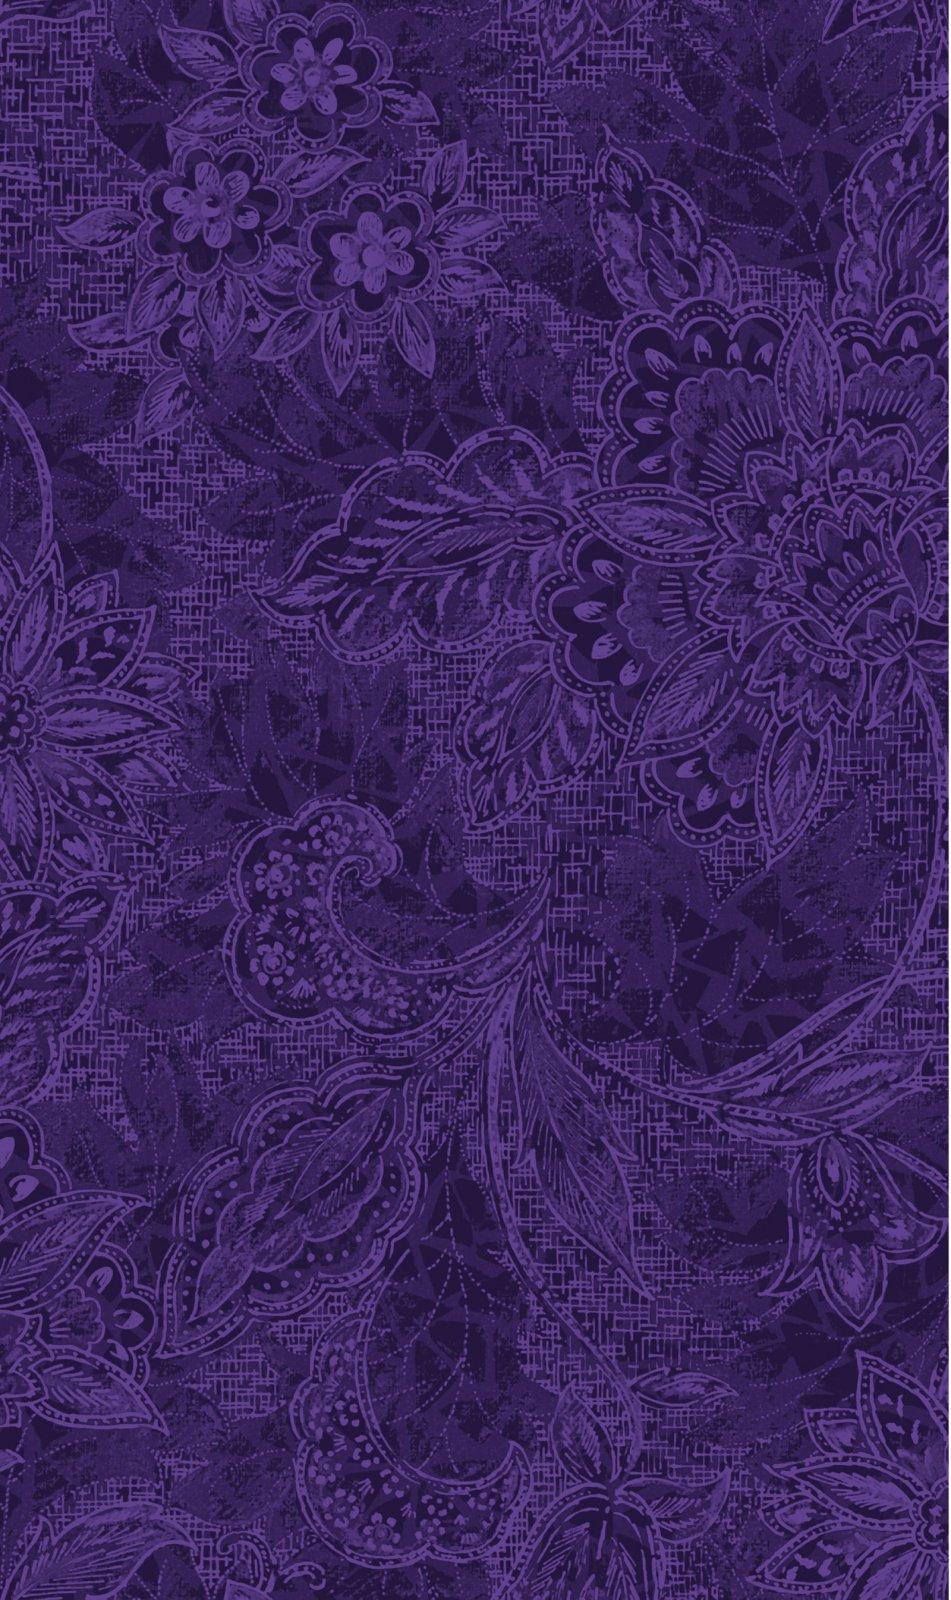 Oasis Fabrics - 118 Wide Quilt Back - Shadow-Jacquard/Amethyst - 1830809/18